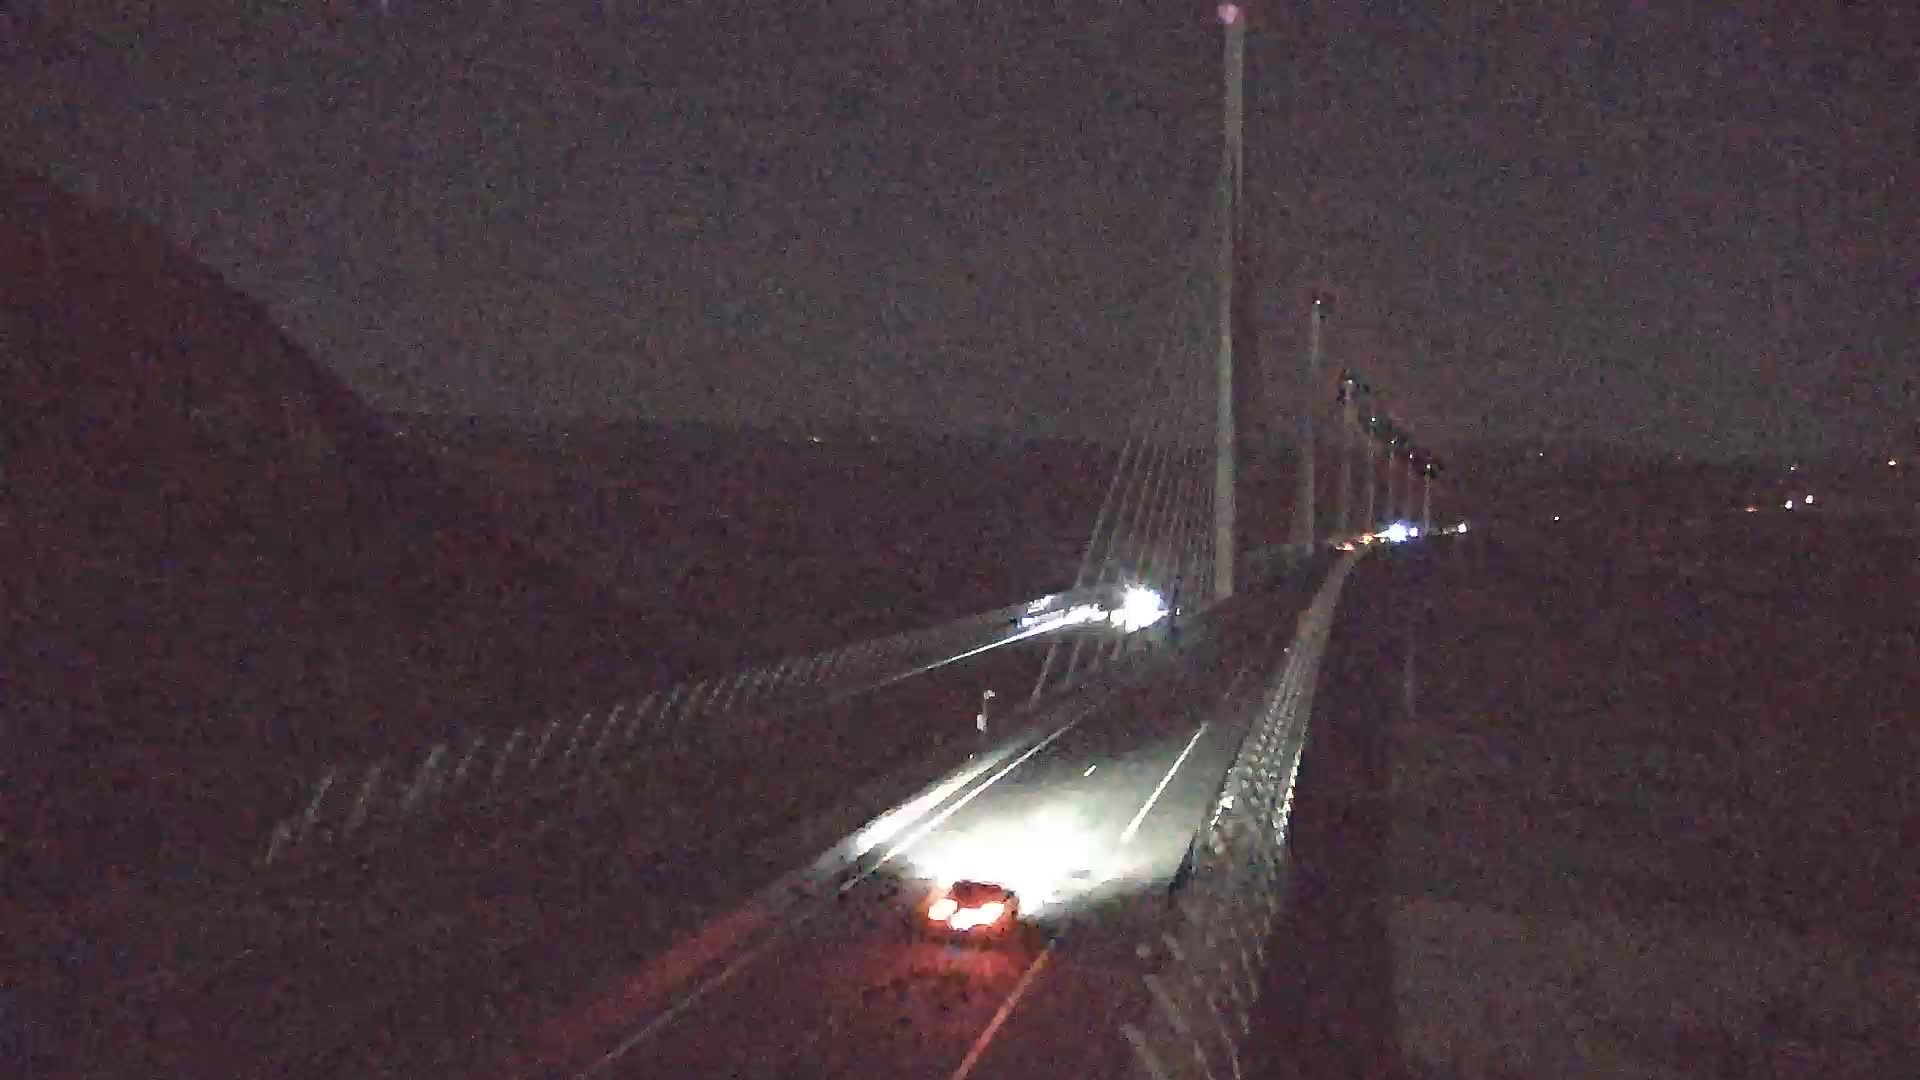 Millau Viaduct Wed. 01:47